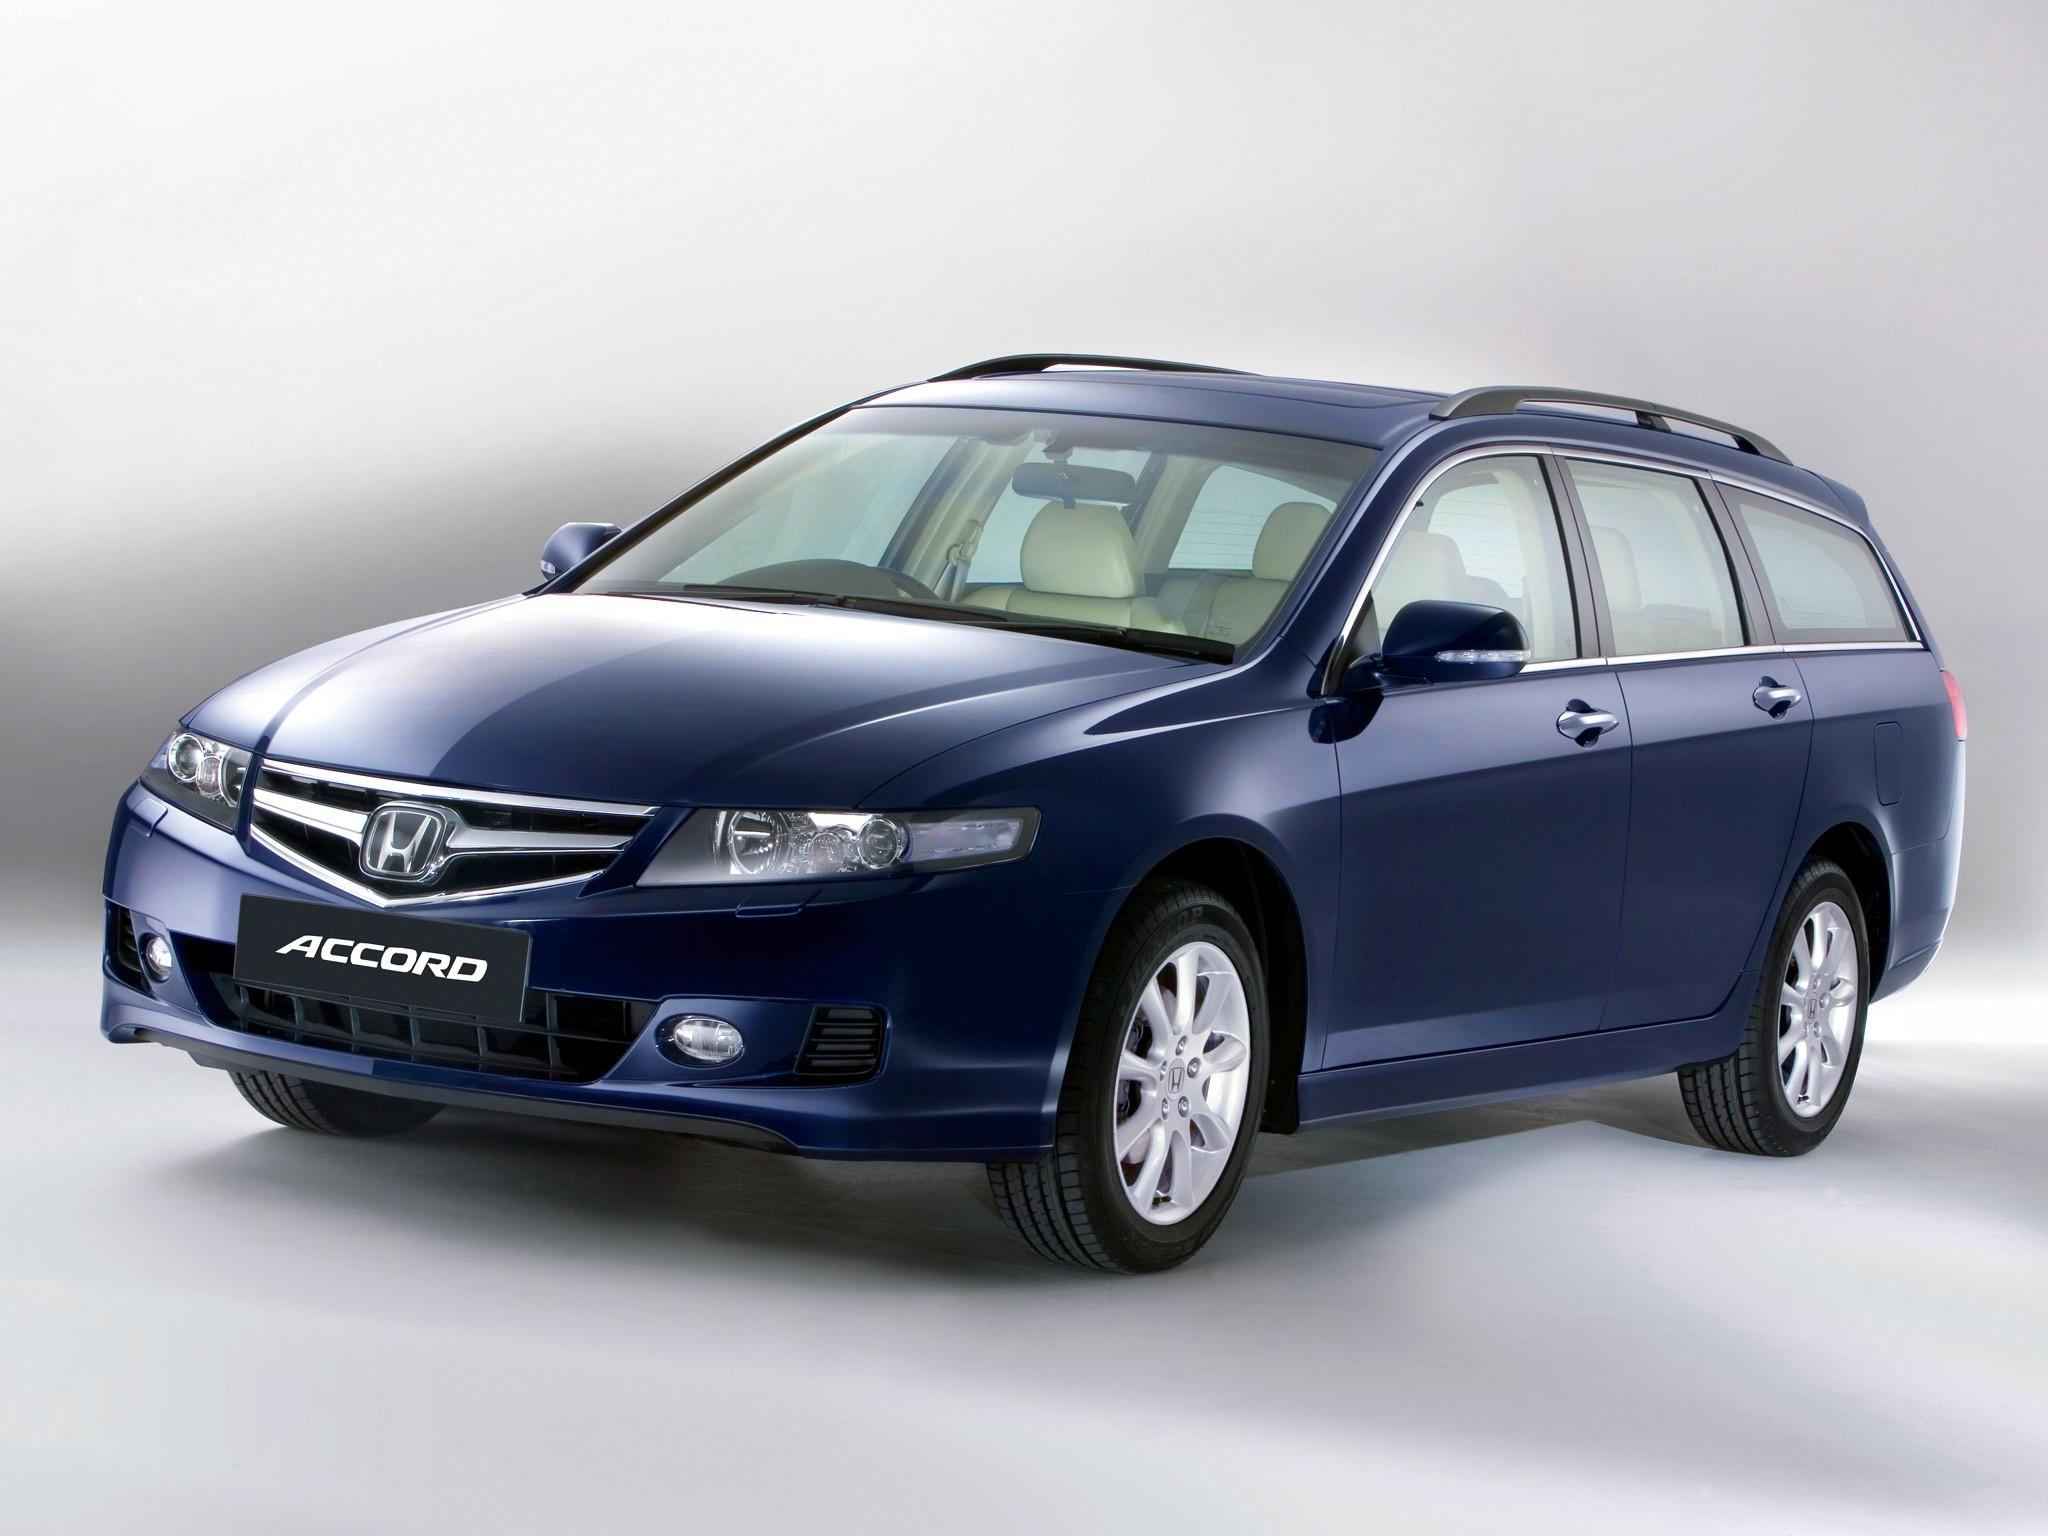 Honda Accord Station Wagon >> HONDA Accord Tourer specs & photos - 2005, 2006, 2007, 2008 - autoevolution